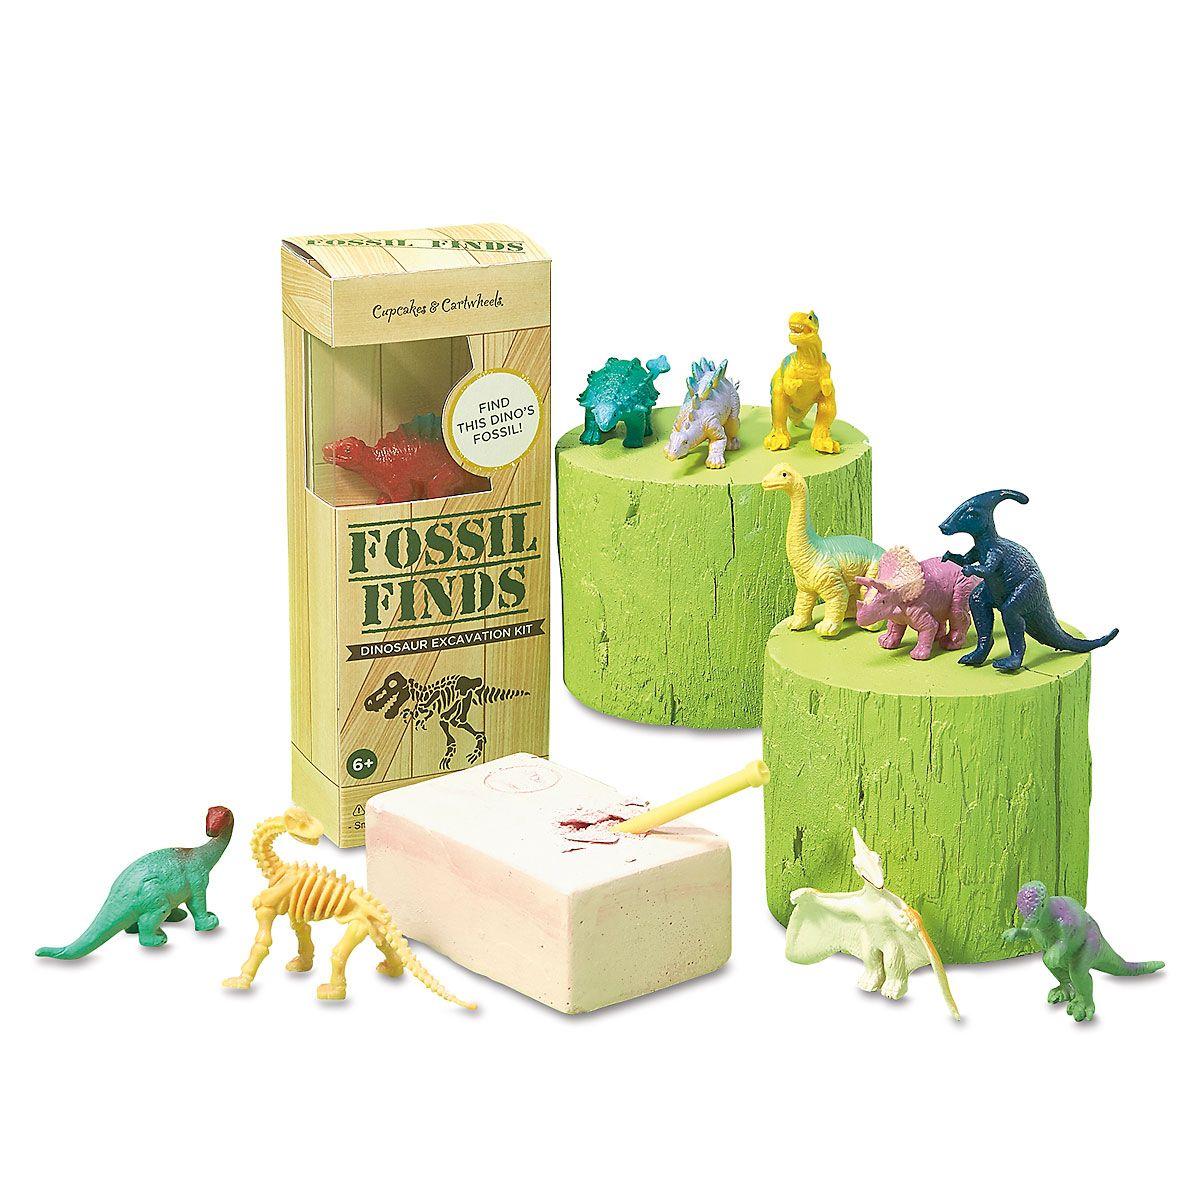 Dino Excavation Kit